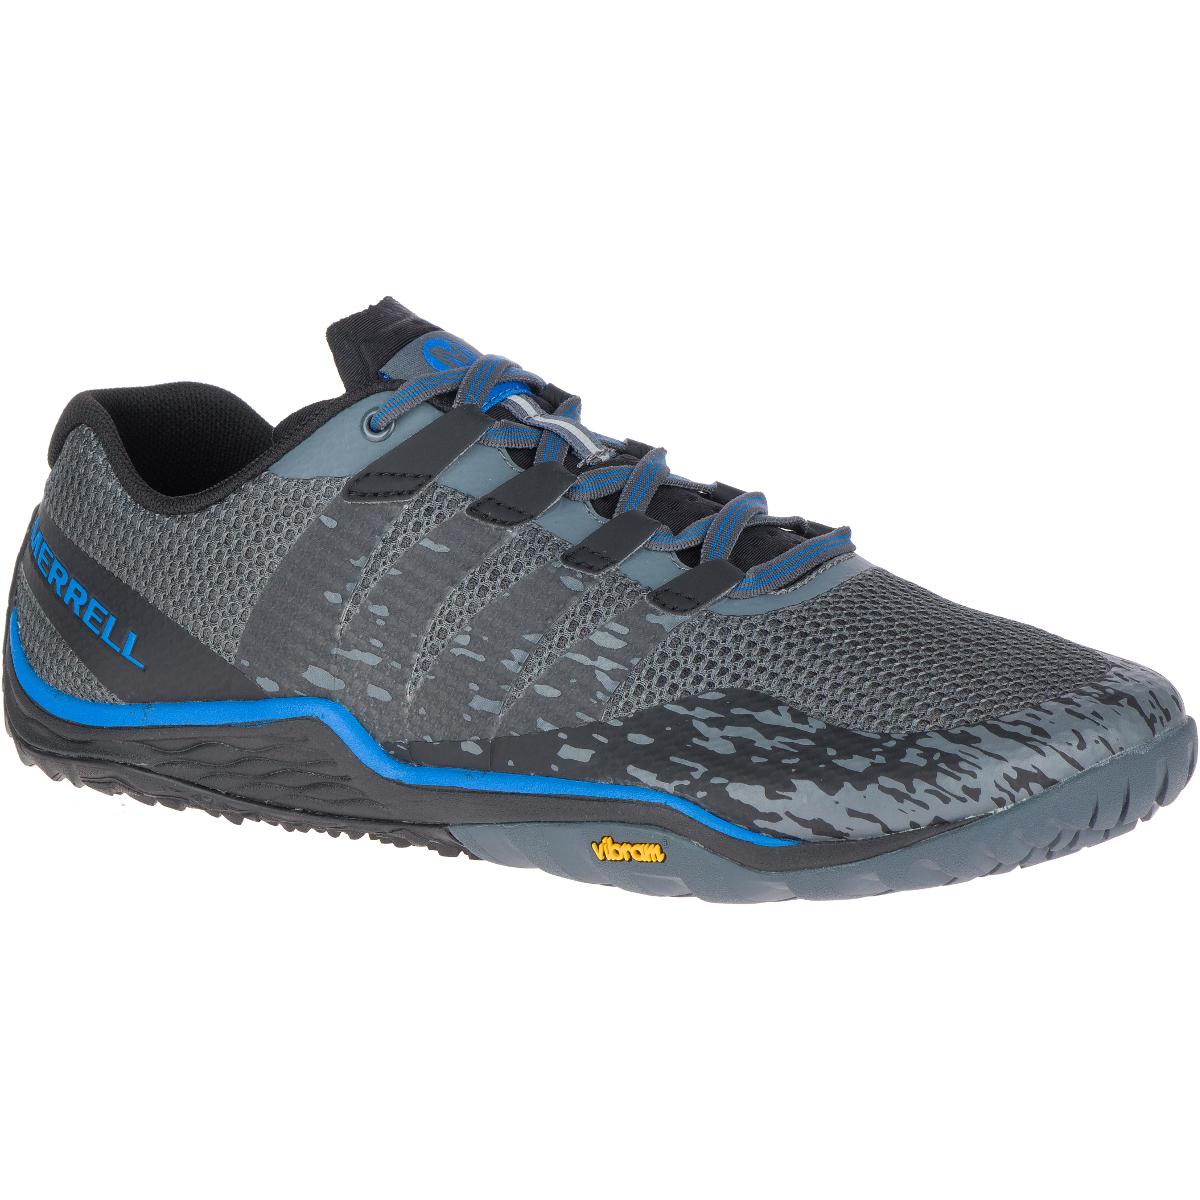 Merrell Men's Trail Glove 5 Barefoot Shoes - Black, 9.5